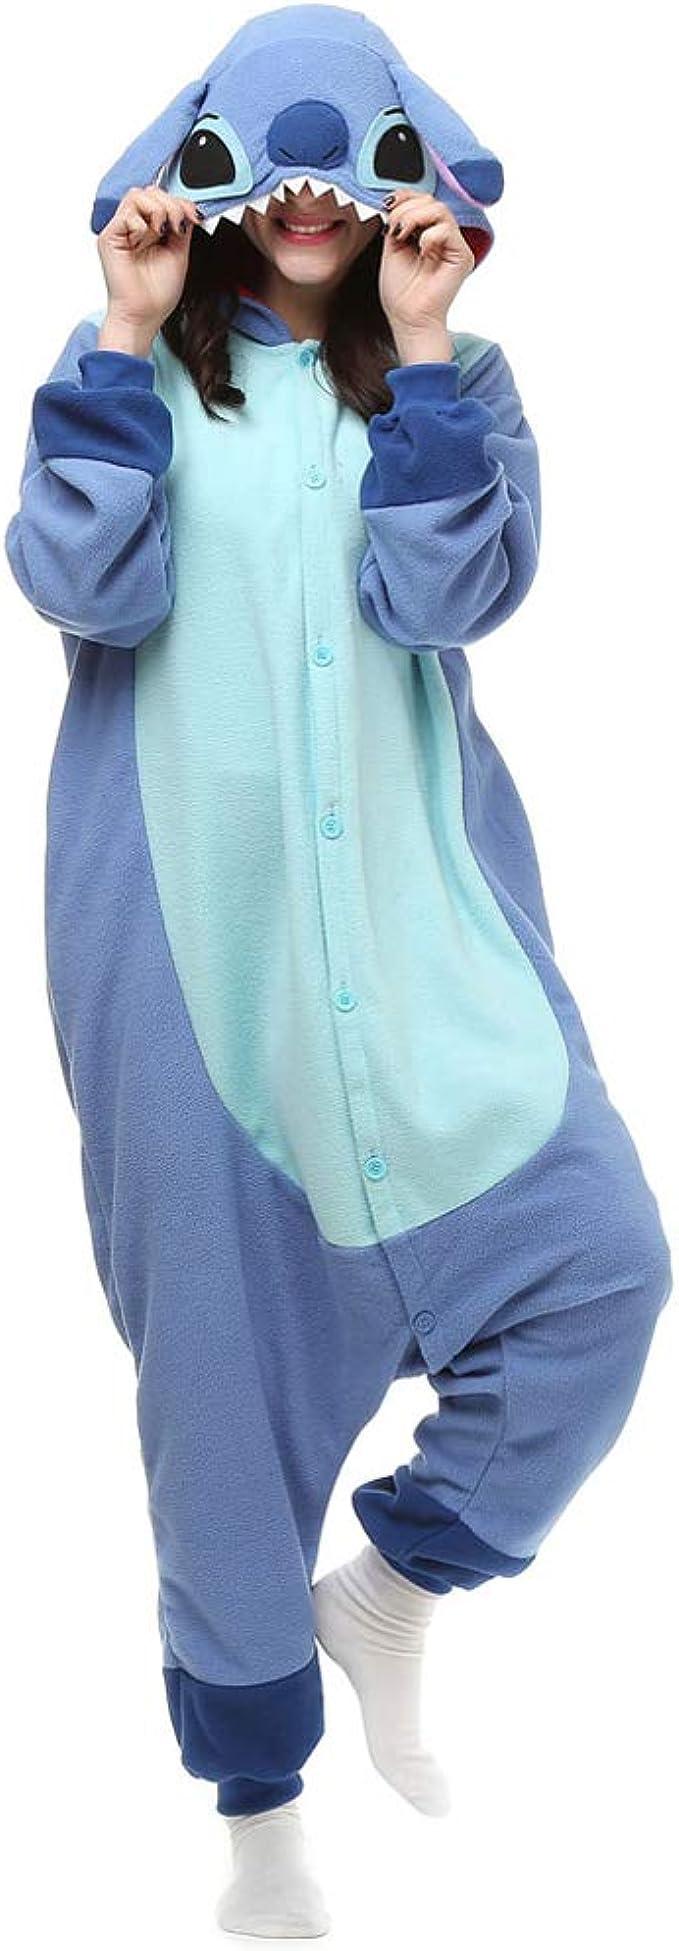 Pijama de Animales, de ANIMAL PJS, para Adultos, para Mujeres ...